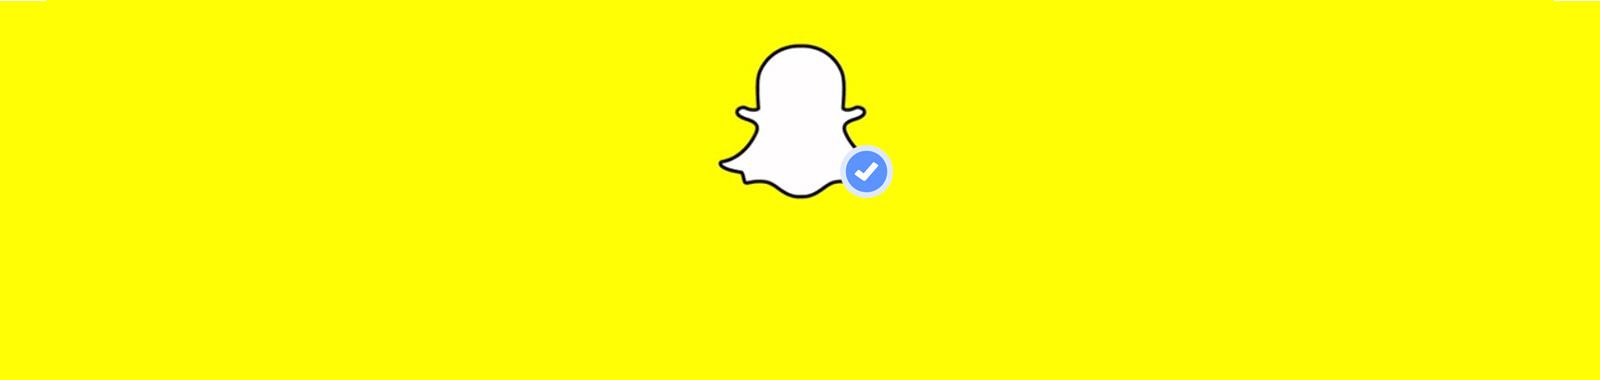 snapchat-banner21